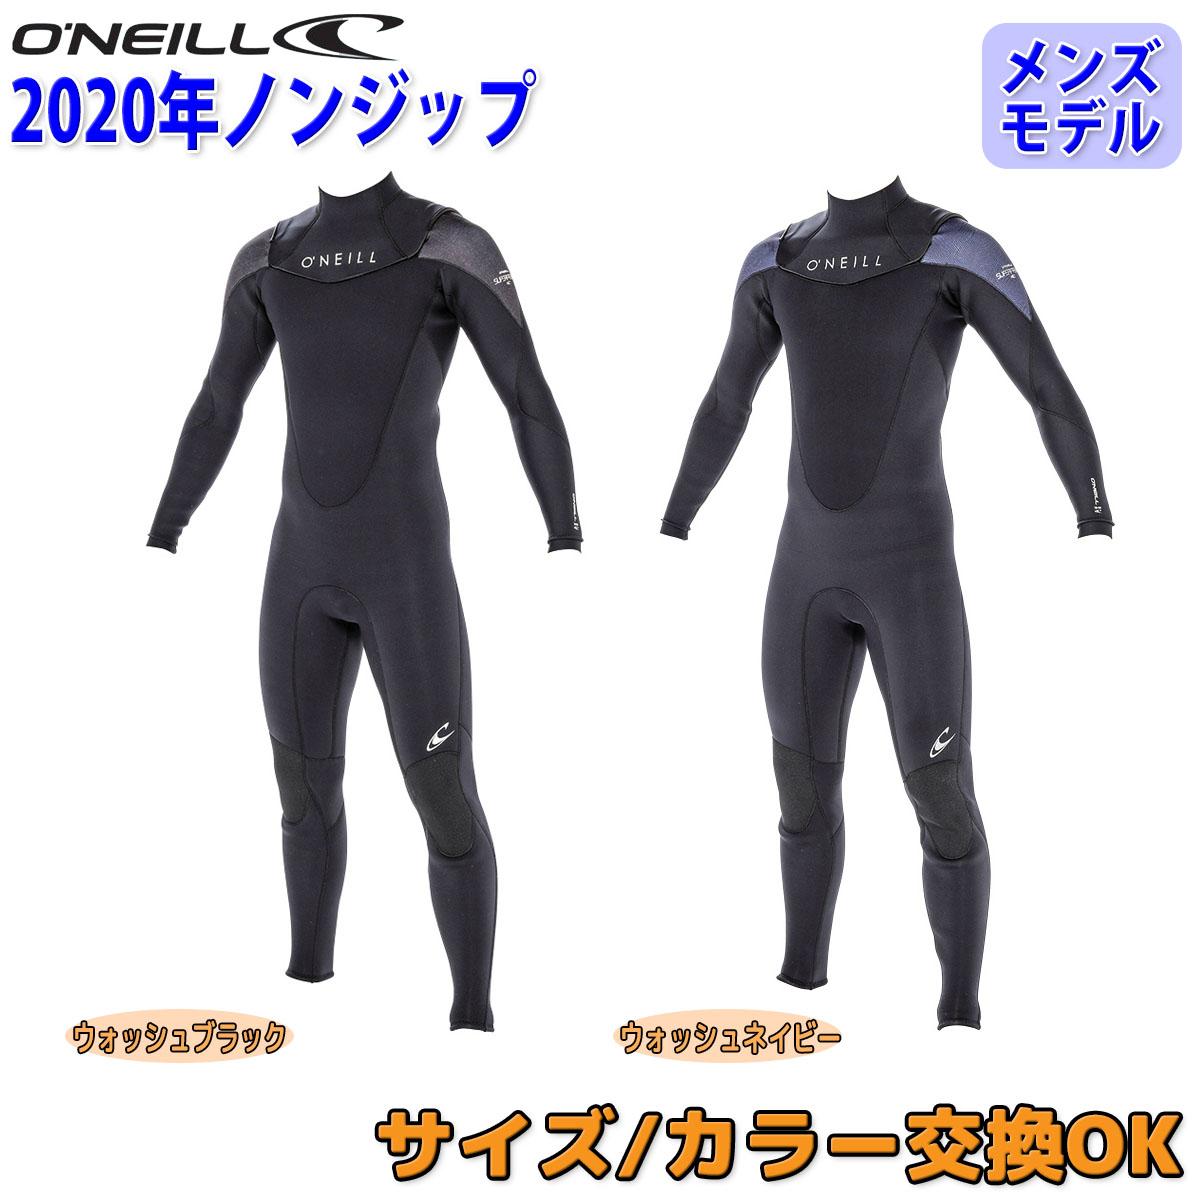 20 O'NEILL オニール フルスーツ ウェットスーツ ウエットスーツ ノンジップ バリュー 春夏用 メンズモデル 2020年 SUPERFREAK Z.E.N. スーパーフリーク ゼン品番 WF-7260 日本正規品